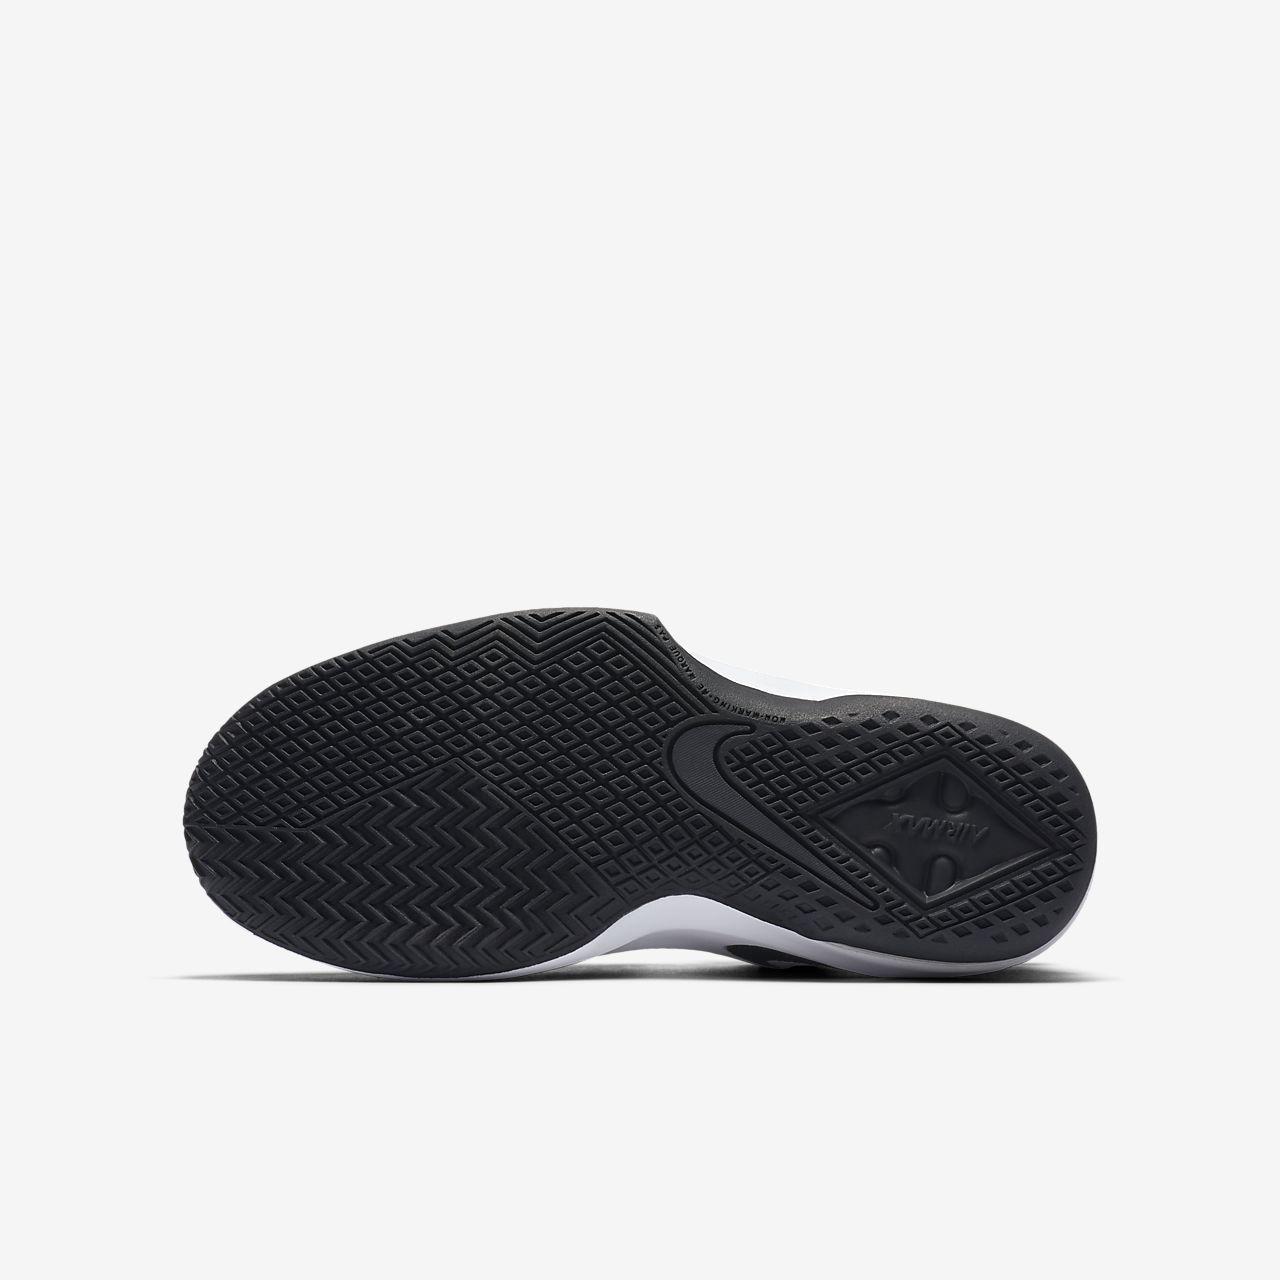 bbca380fda ... Nike Air Max Infuriate II Mid Younger/Older Kids' Basketball Shoe